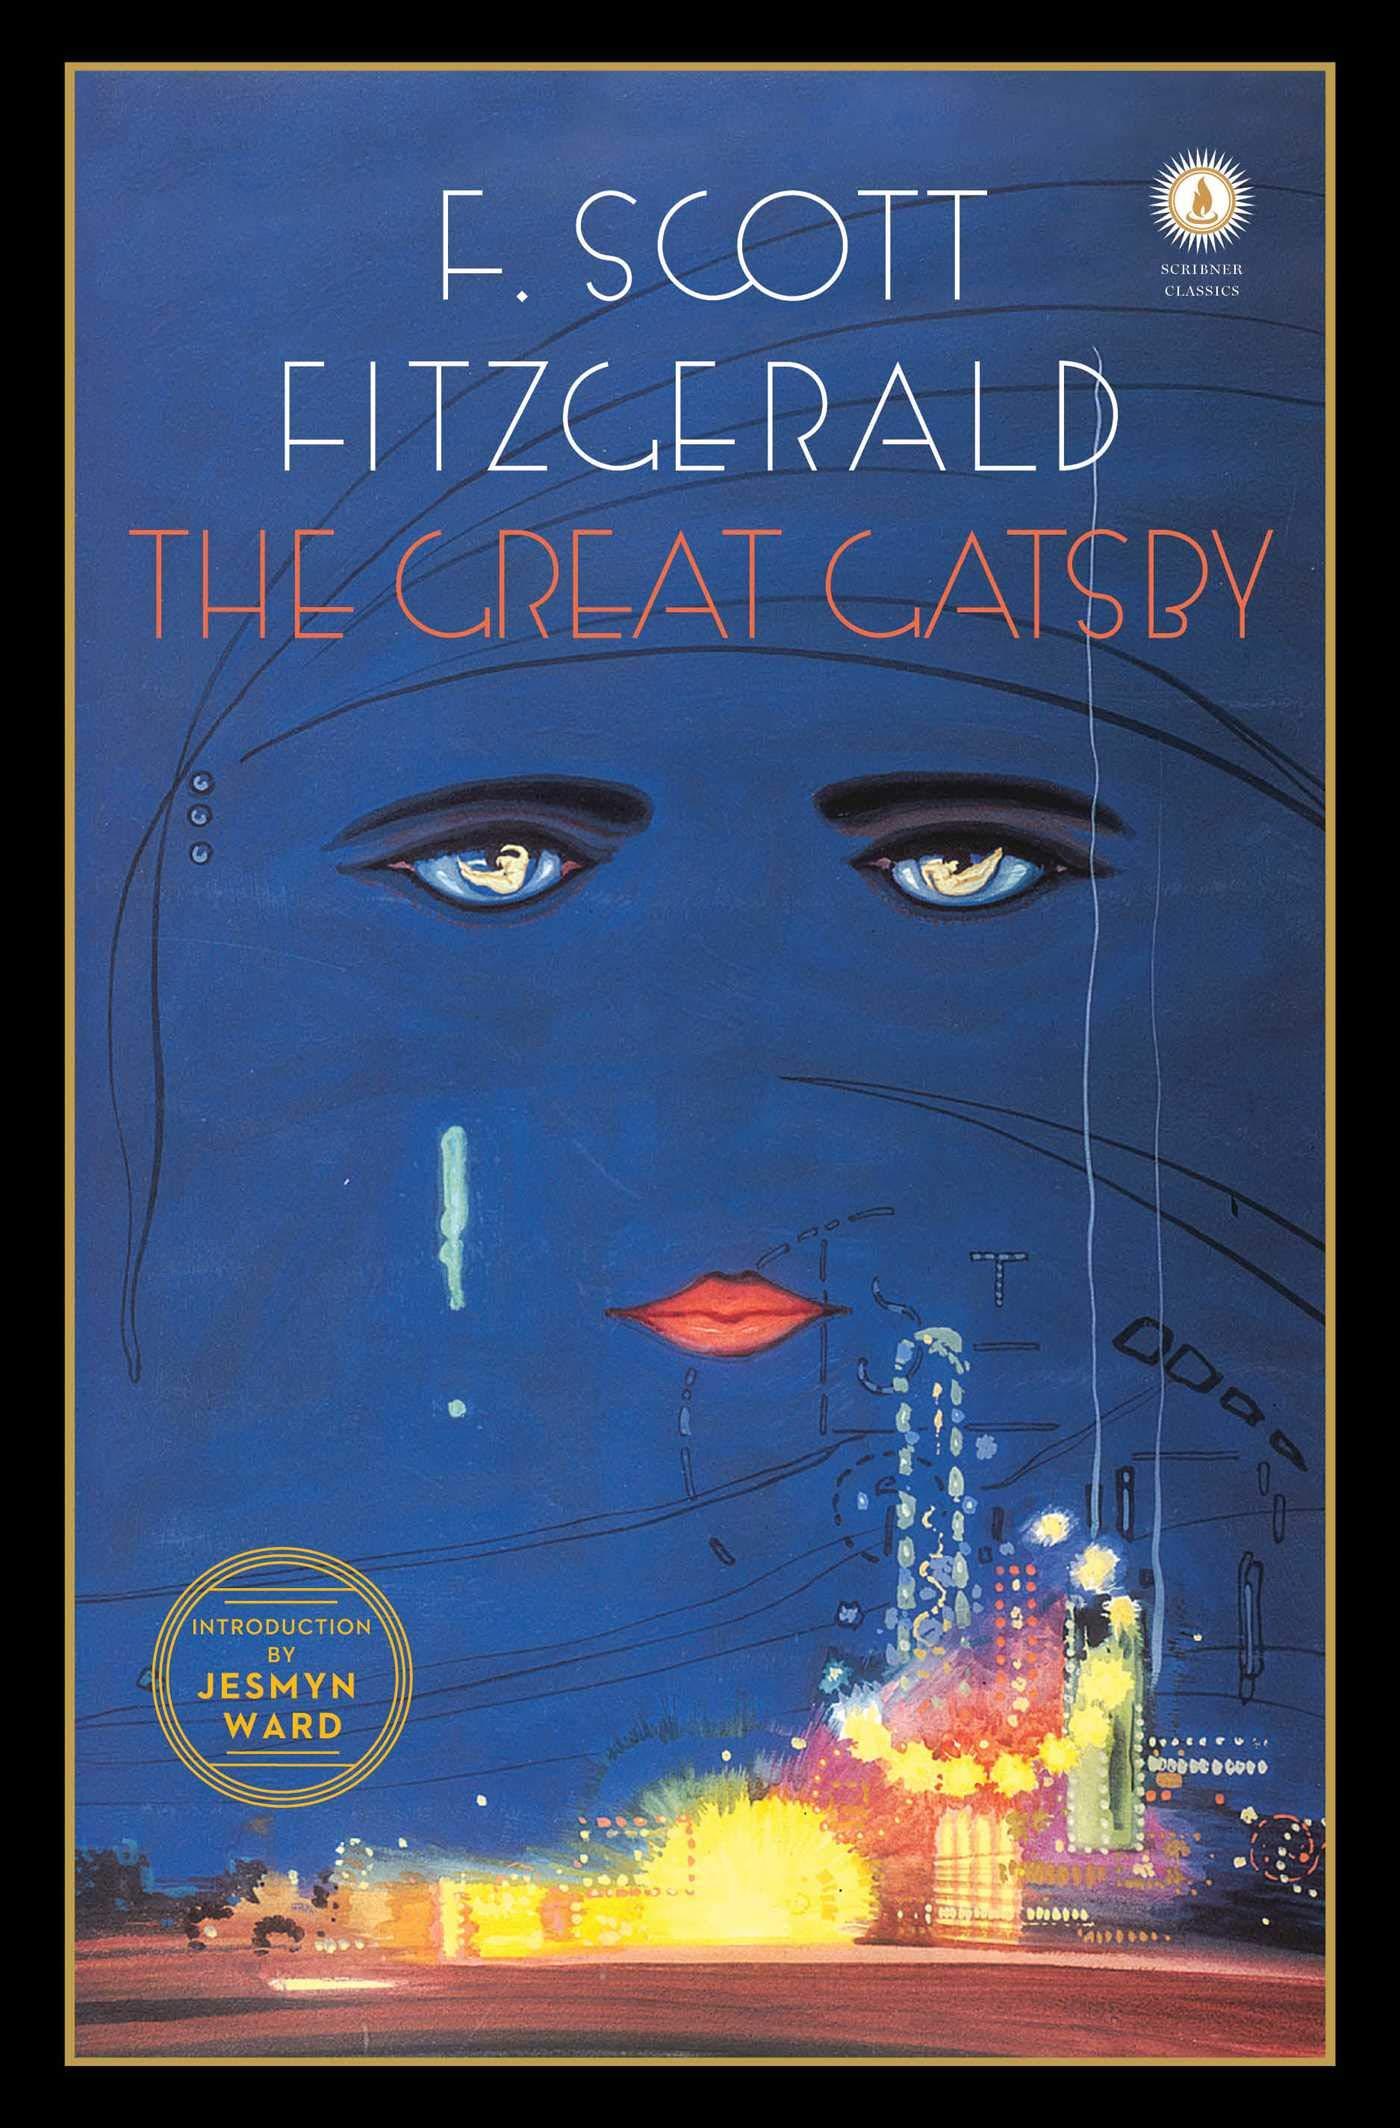 The Great Gatsby: The Authorized Edition (Scribner Classics): F. Scott  Fitzgerald: 9780684830421: Amazon.com: Books